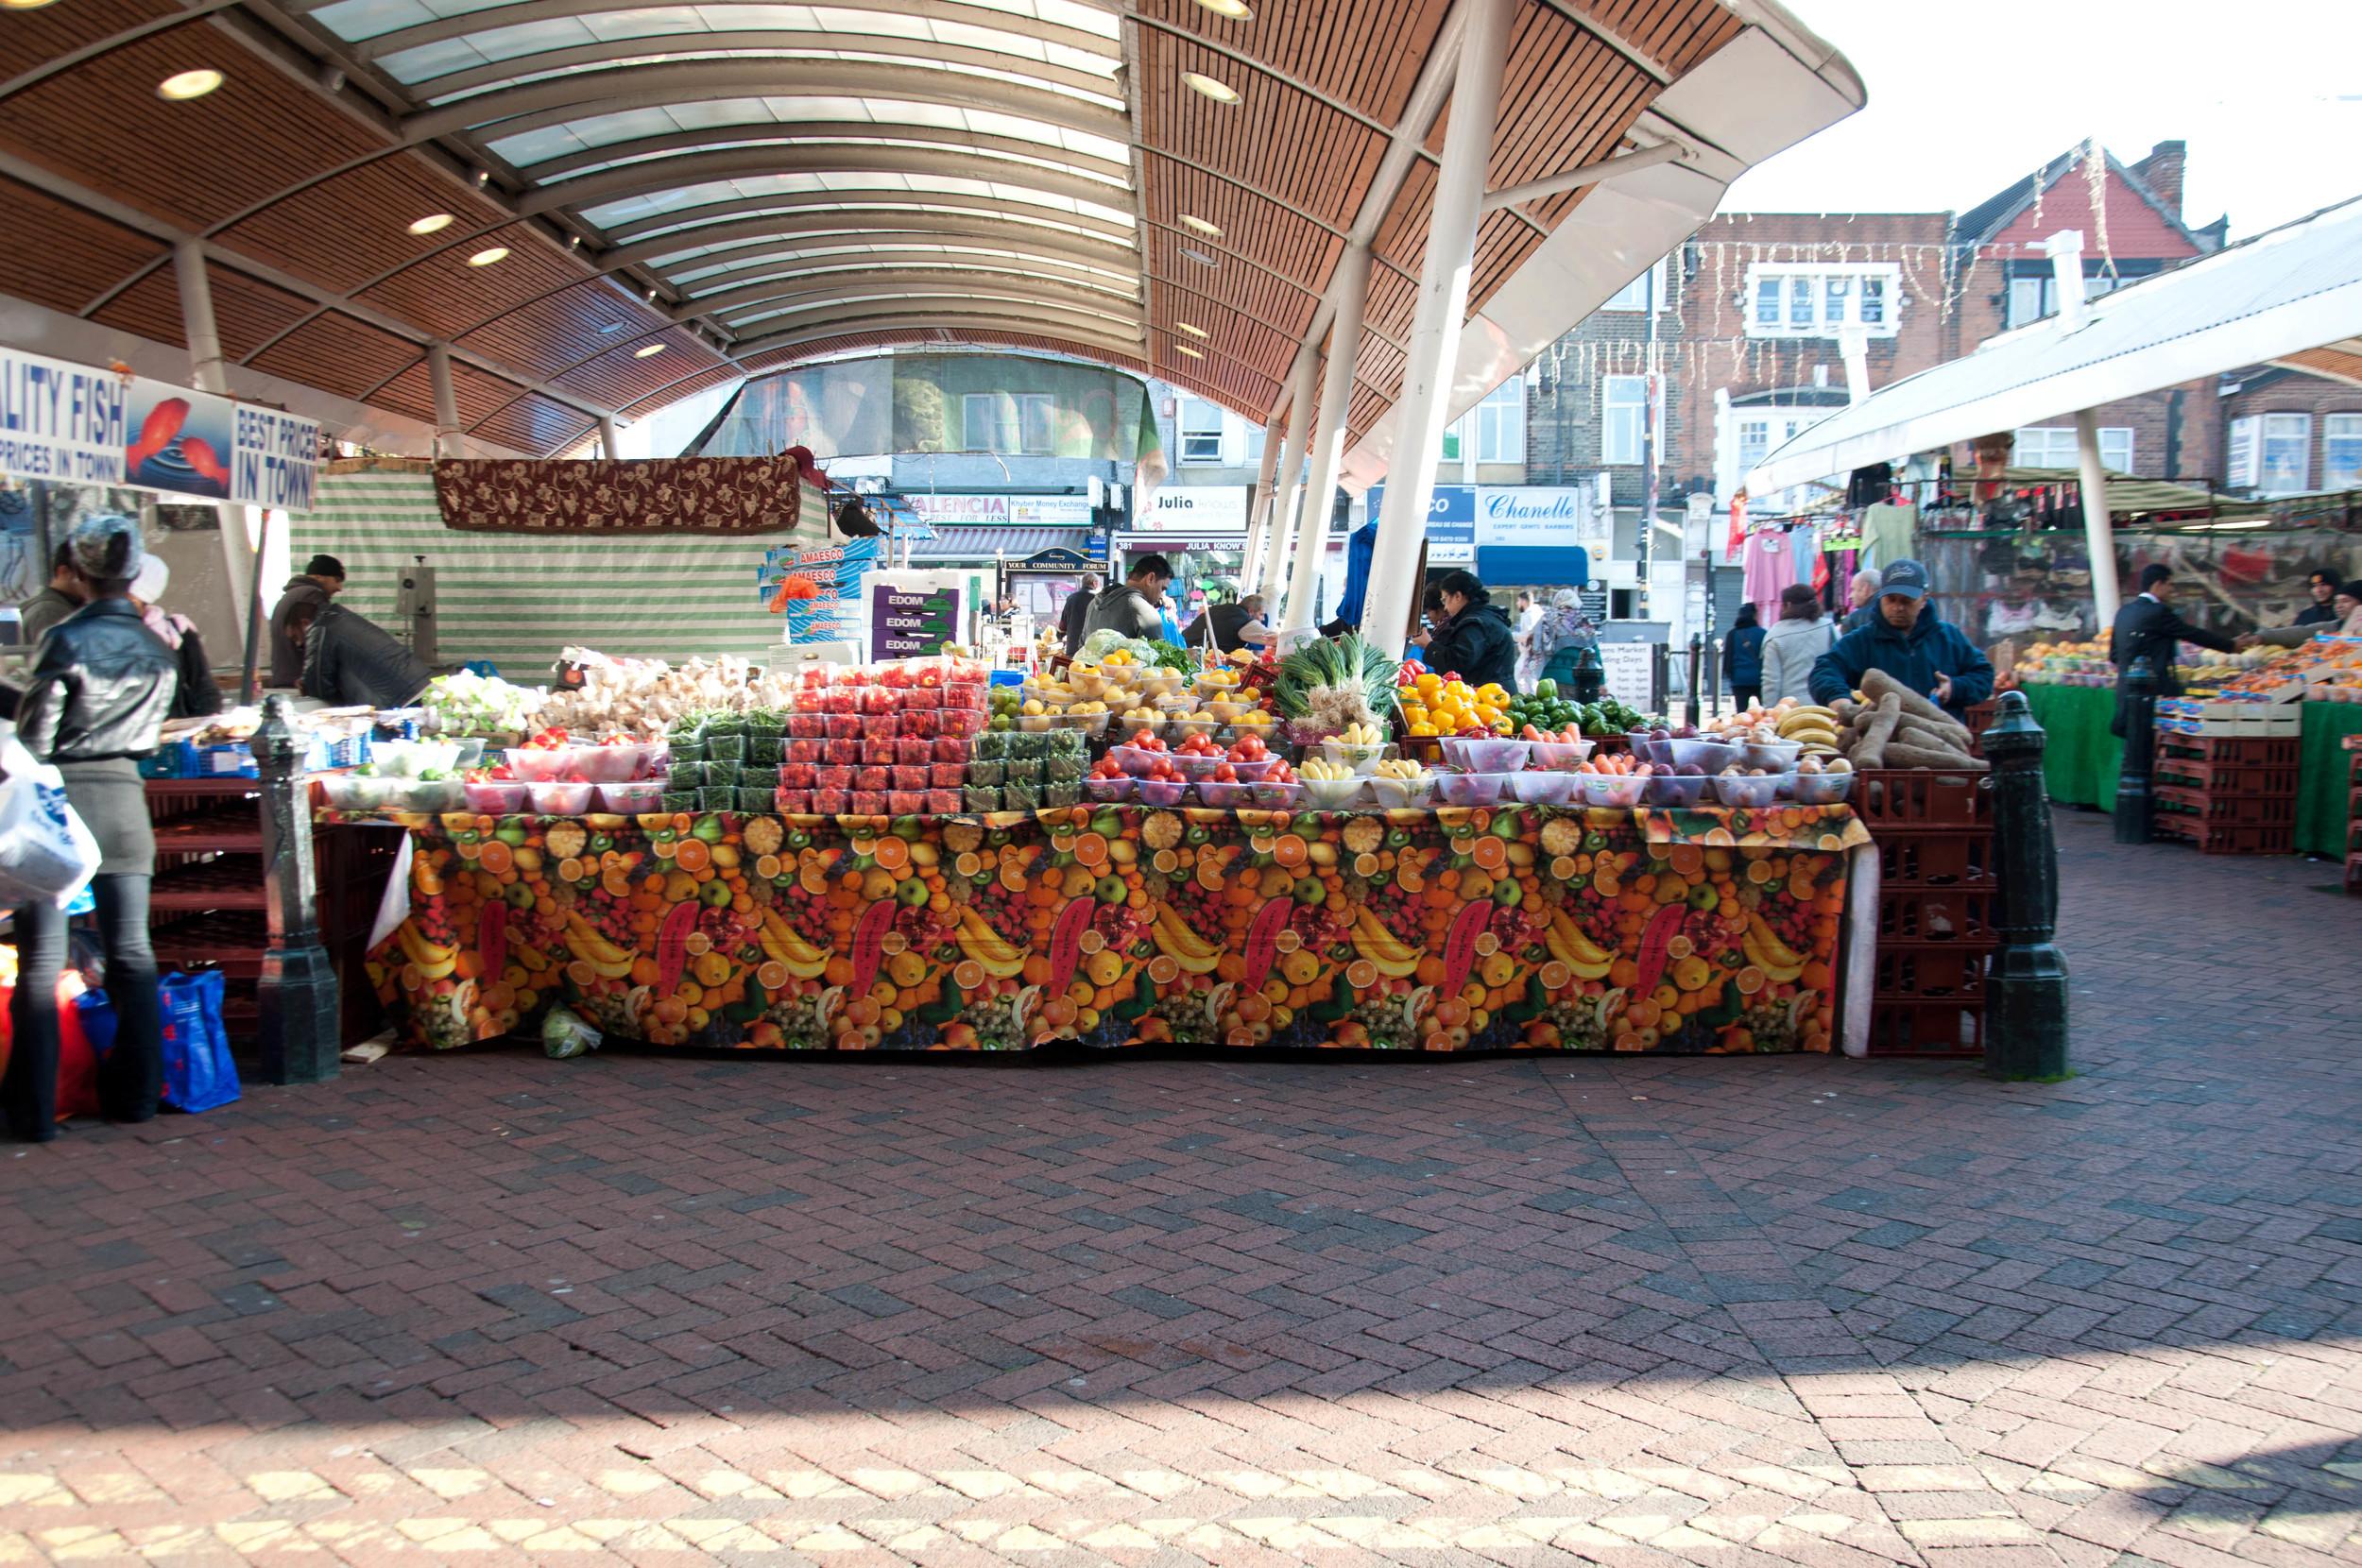 Fruit and Veg stall image 2 of 7.jpg